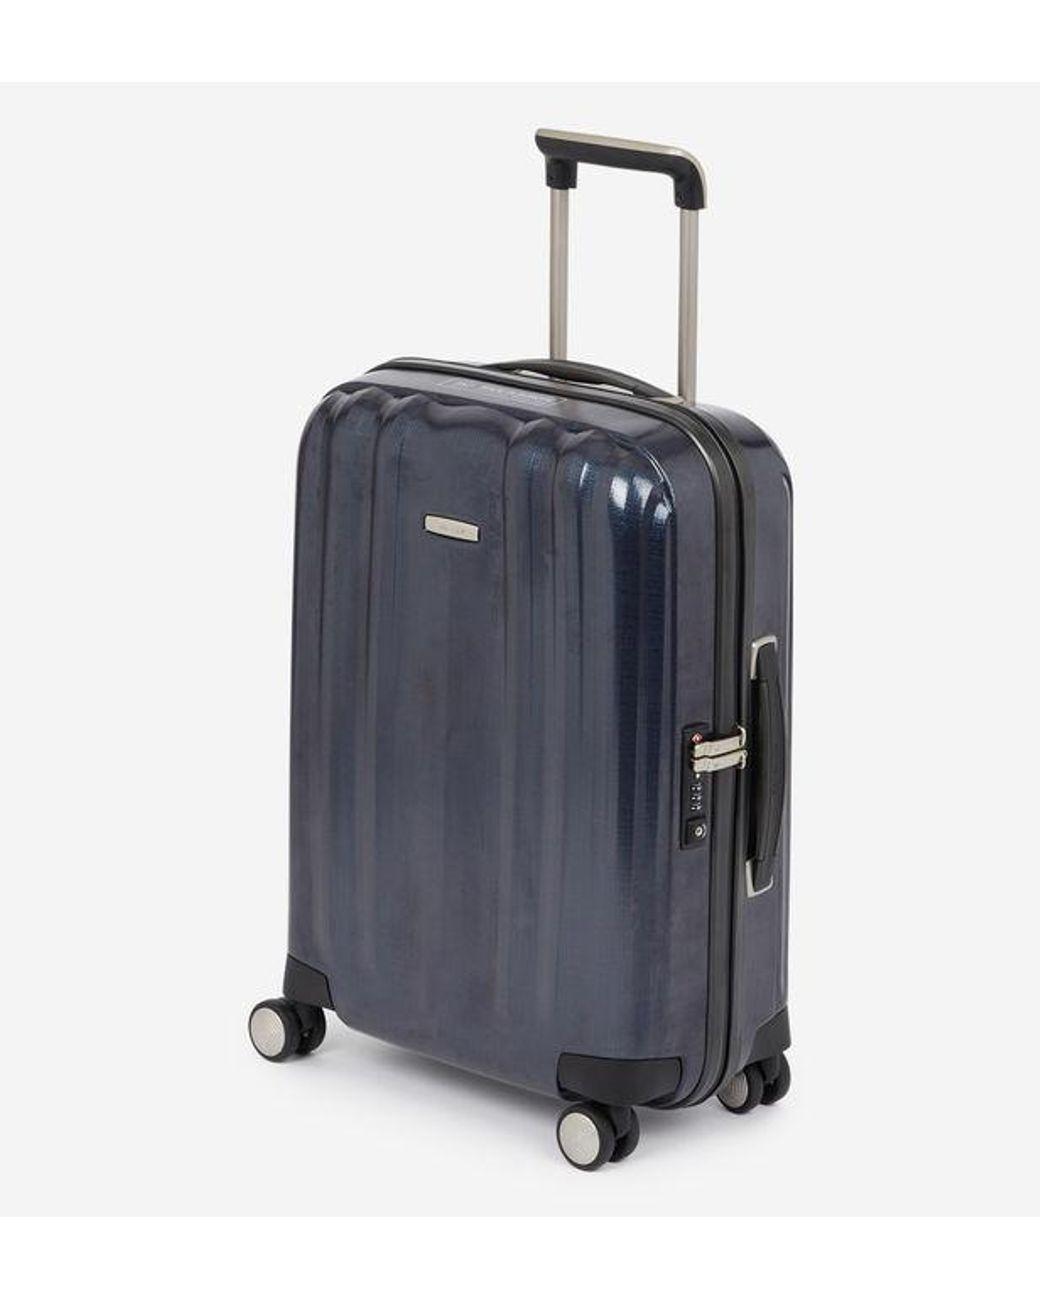 7ed2bd651e Valise rigide cabine Spinner Llte Cube 4R 55 cm Samsonite pour homme en  coloris Bleu - Lyst